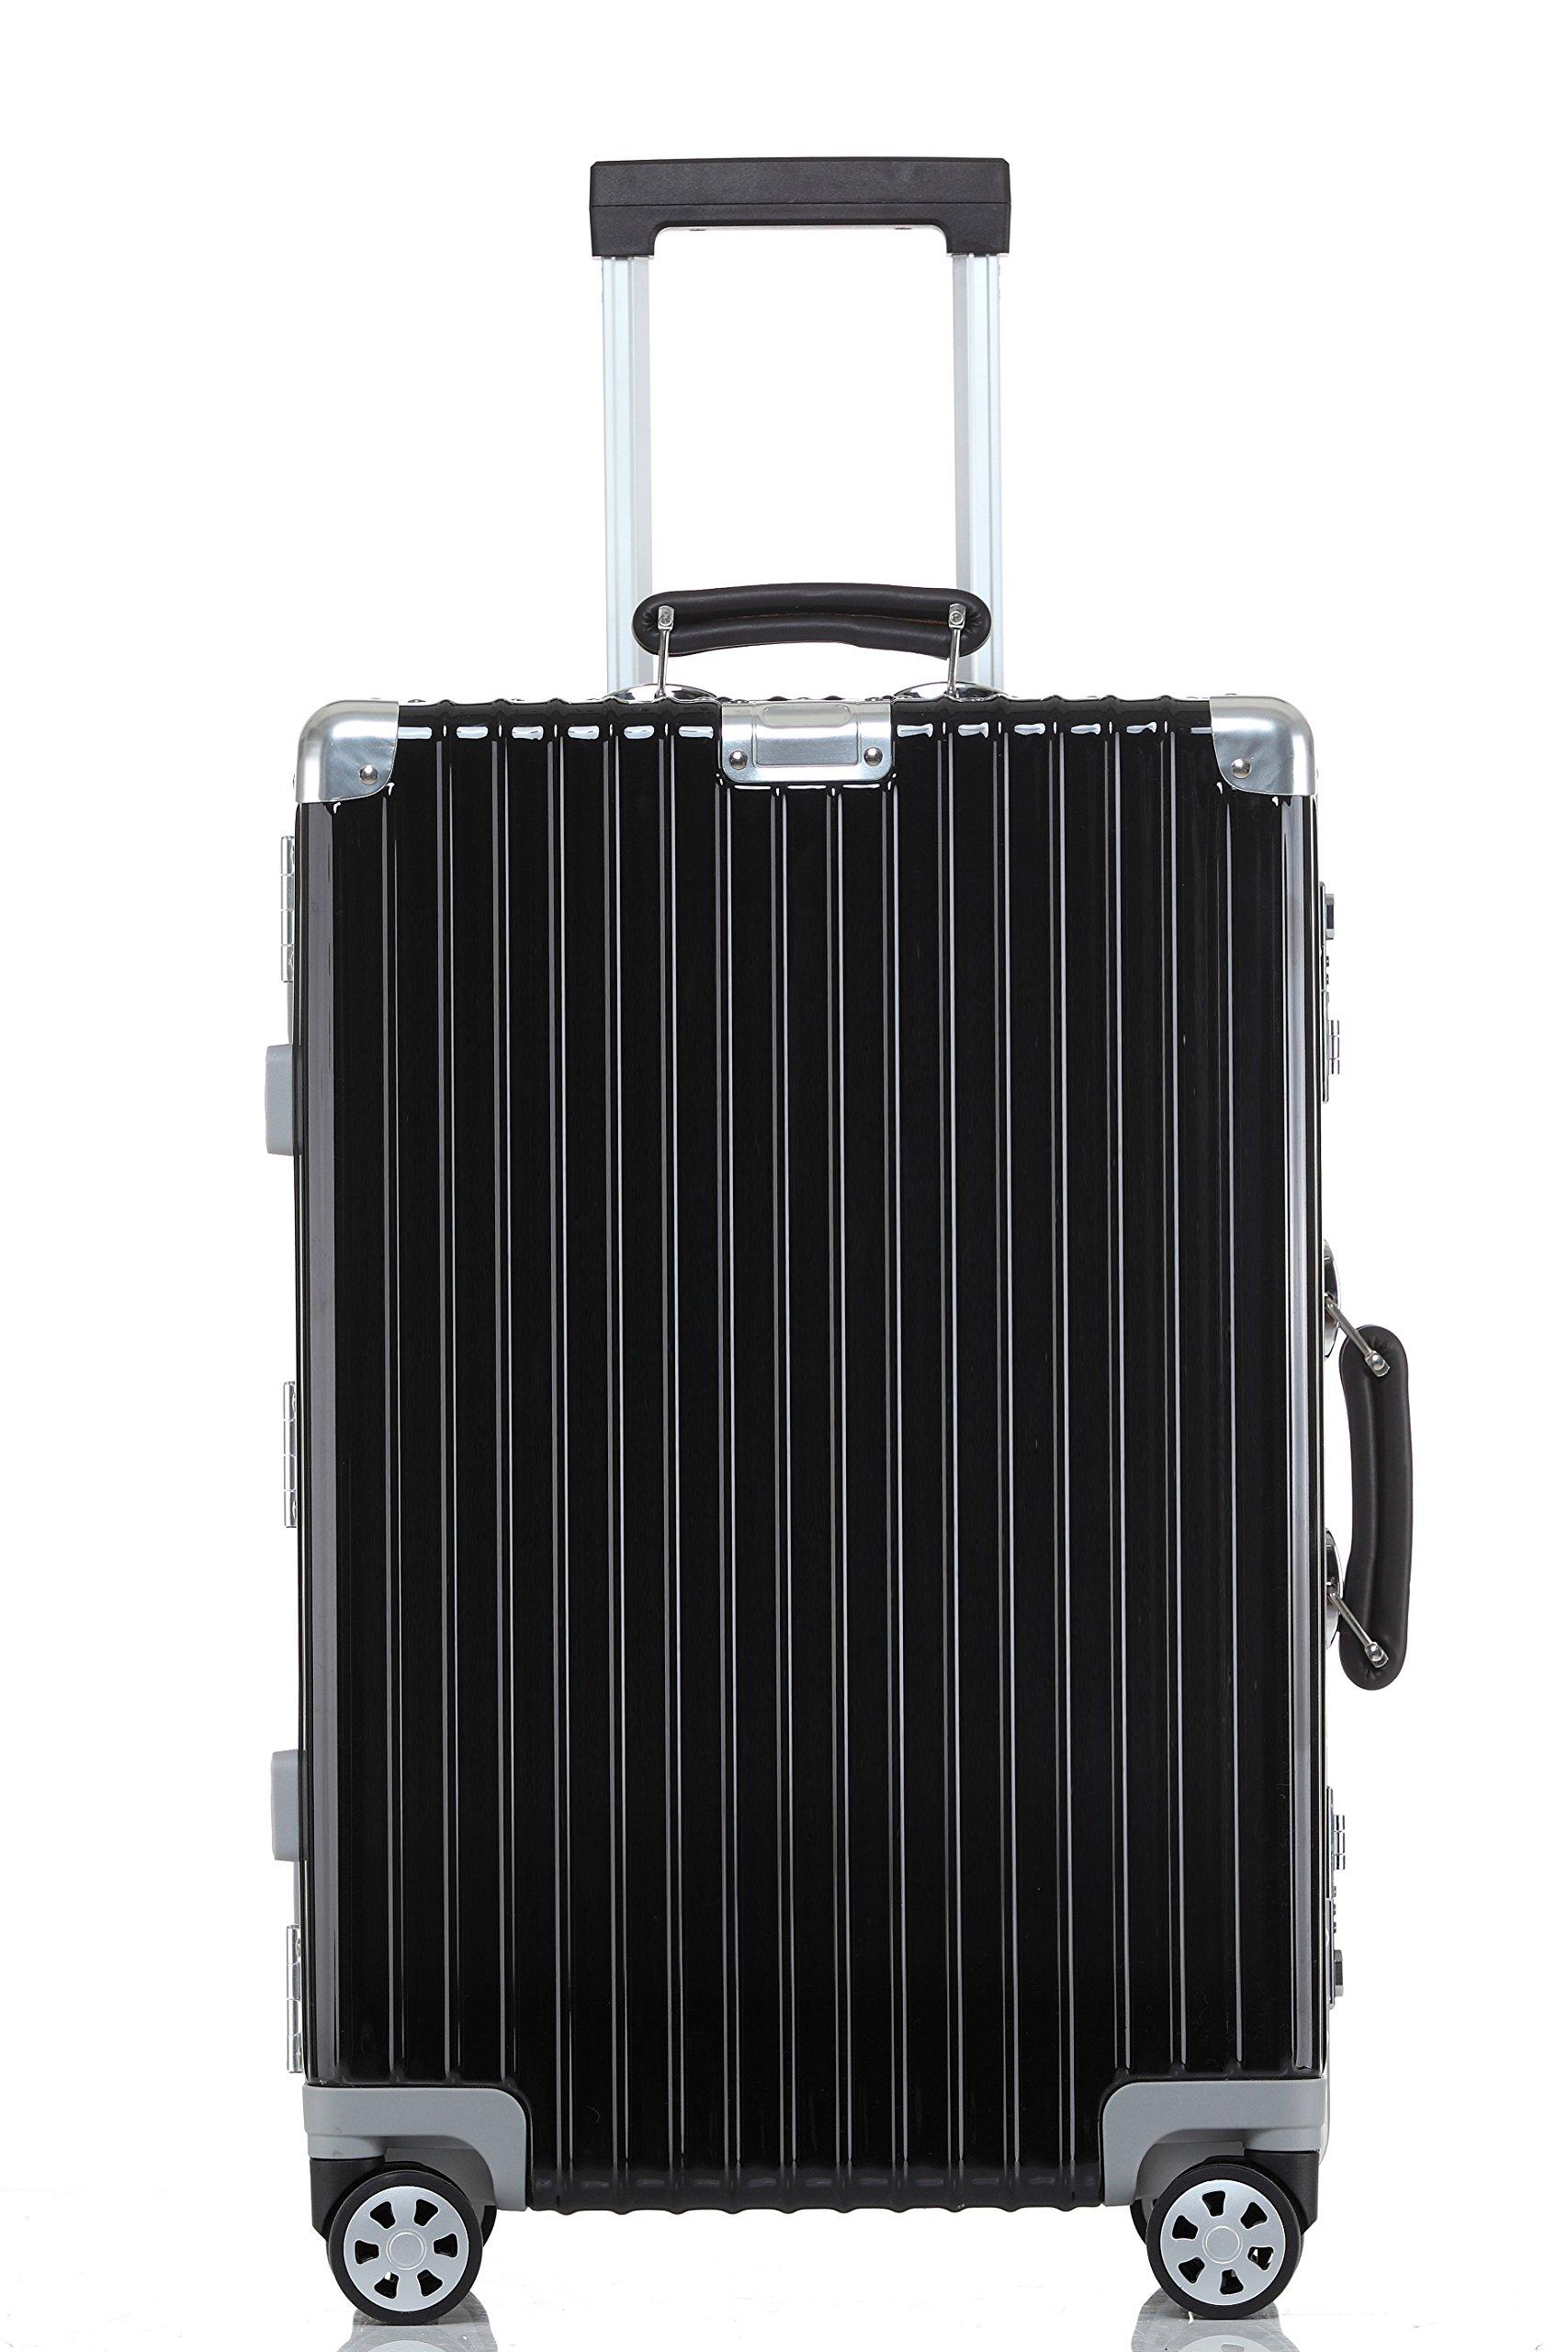 Lightweight Luggage, Clothink Aluminum Frame Spinner Modern Hardside Travel Suitcase 28 Inch, Black